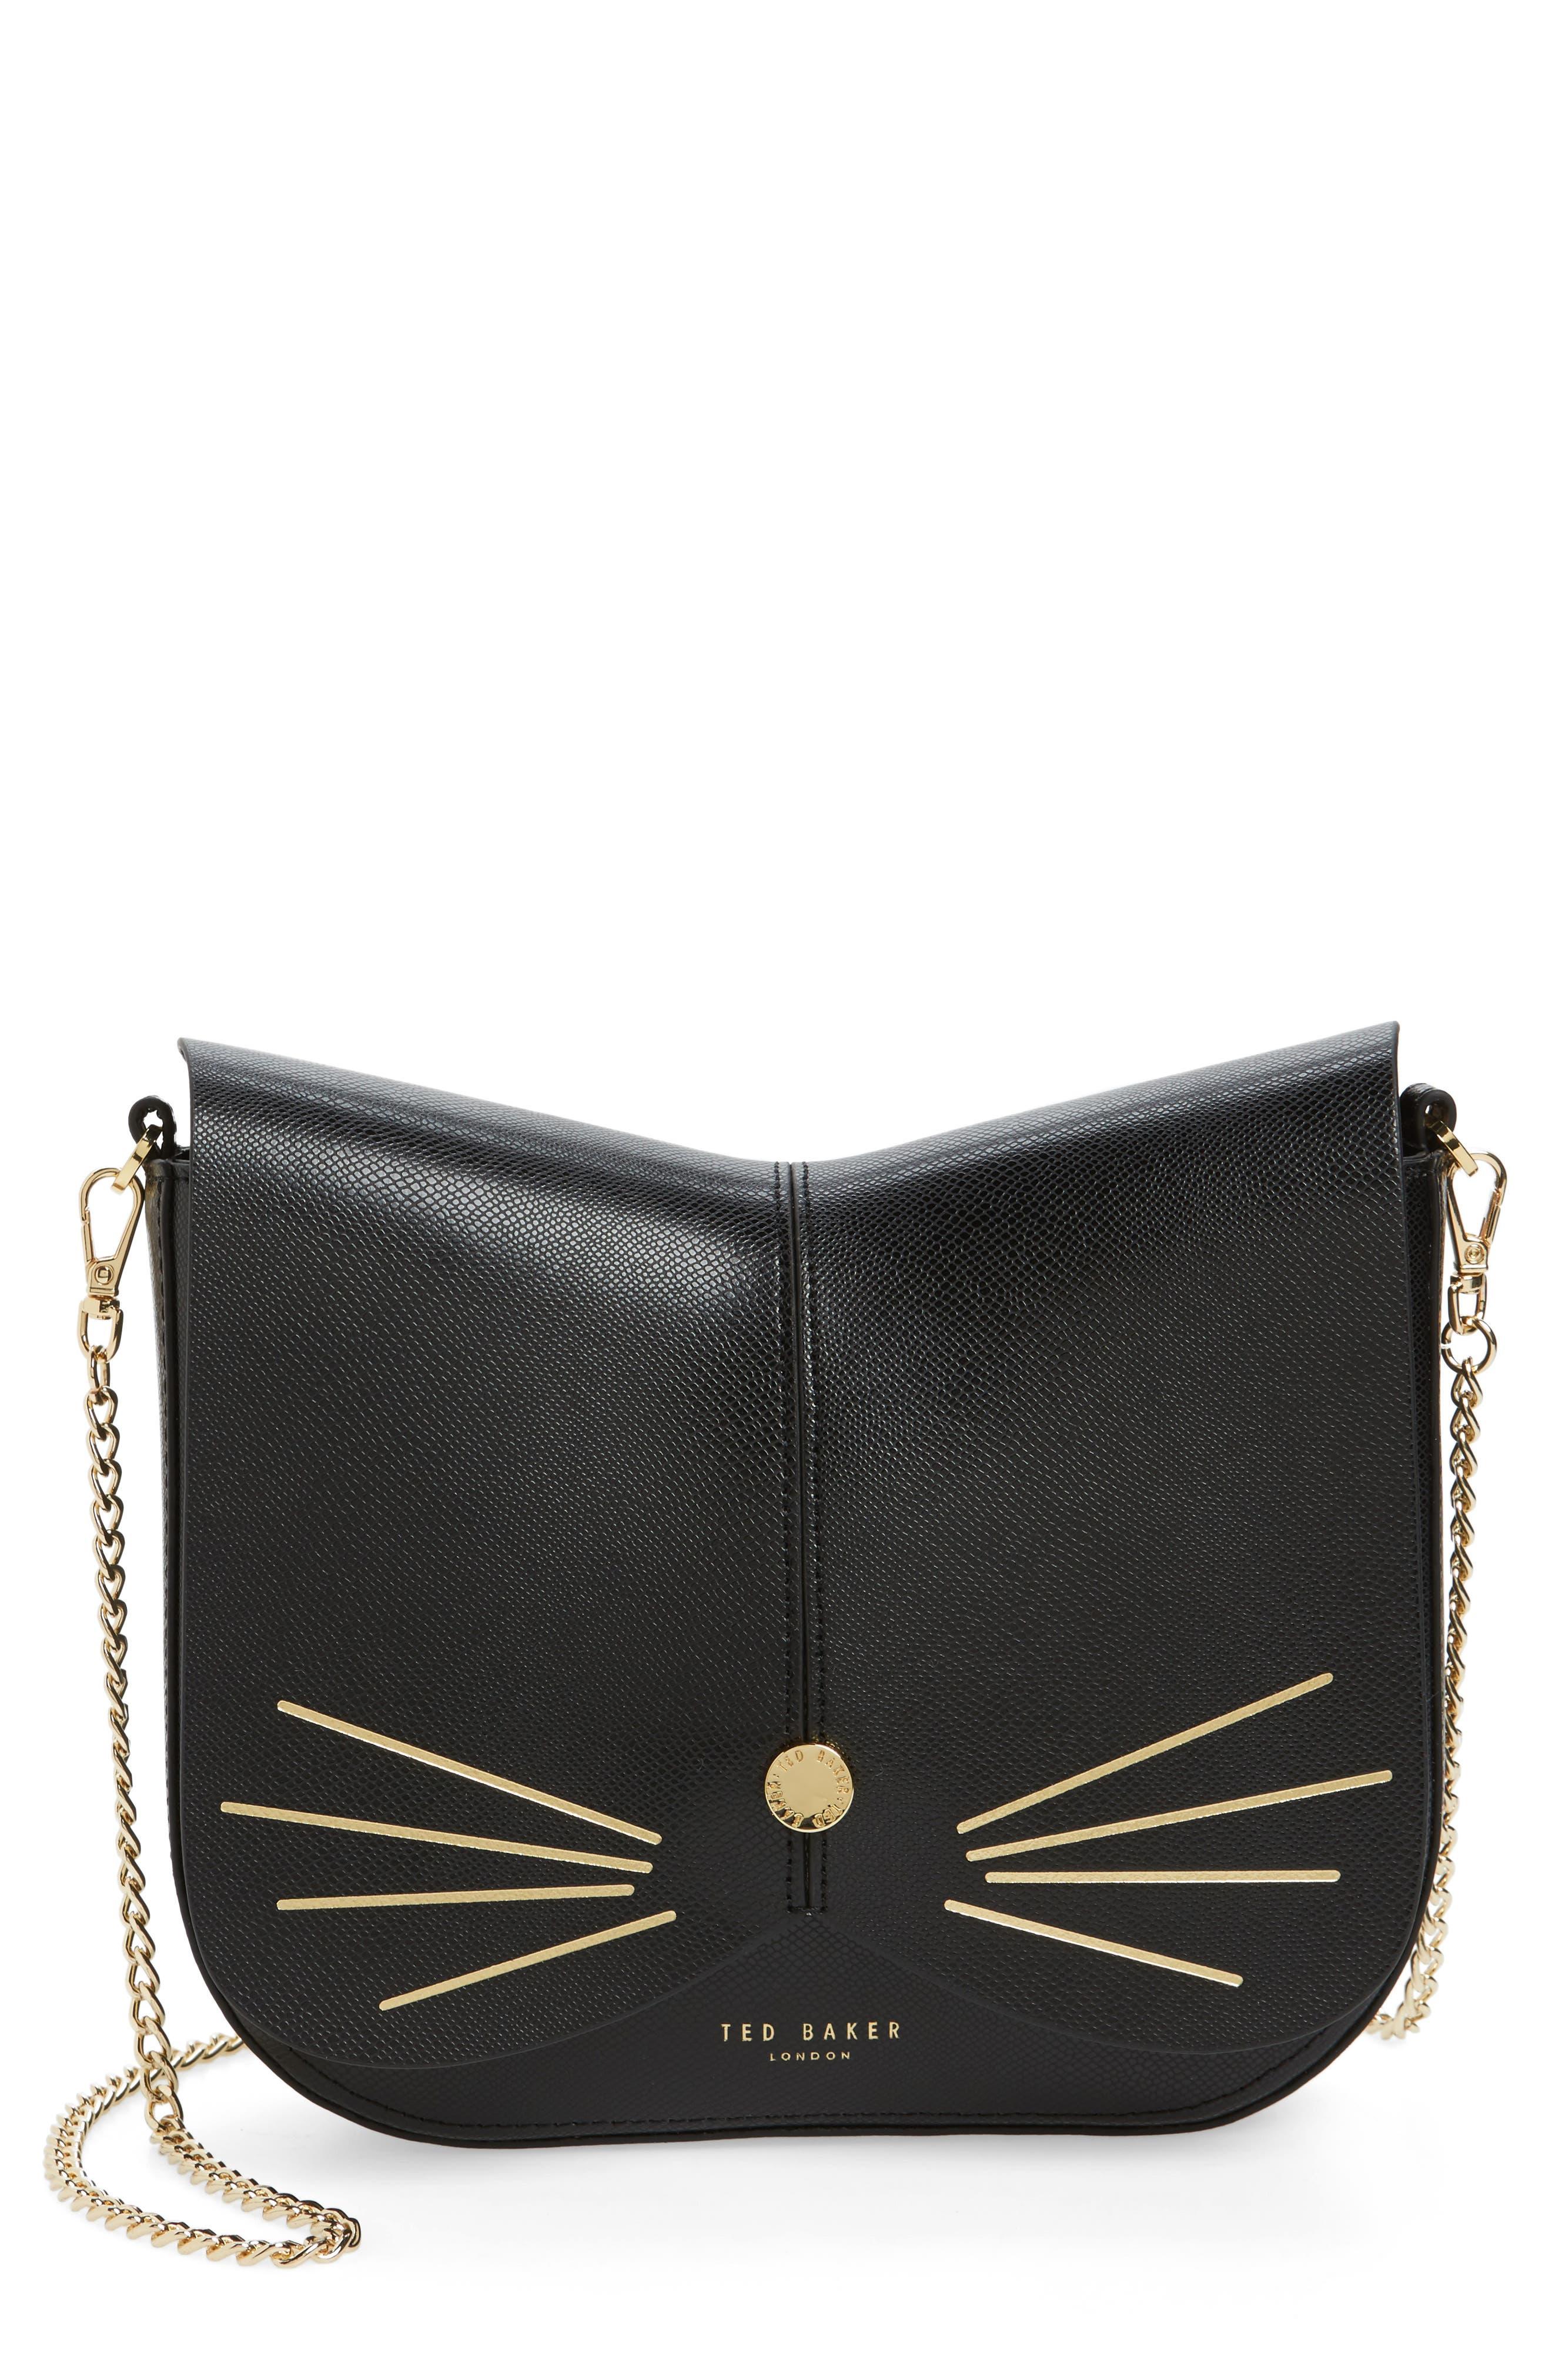 TED BAKER LONDON,                             Cat Leather Crossbody Bag,                             Main thumbnail 1, color,                             001